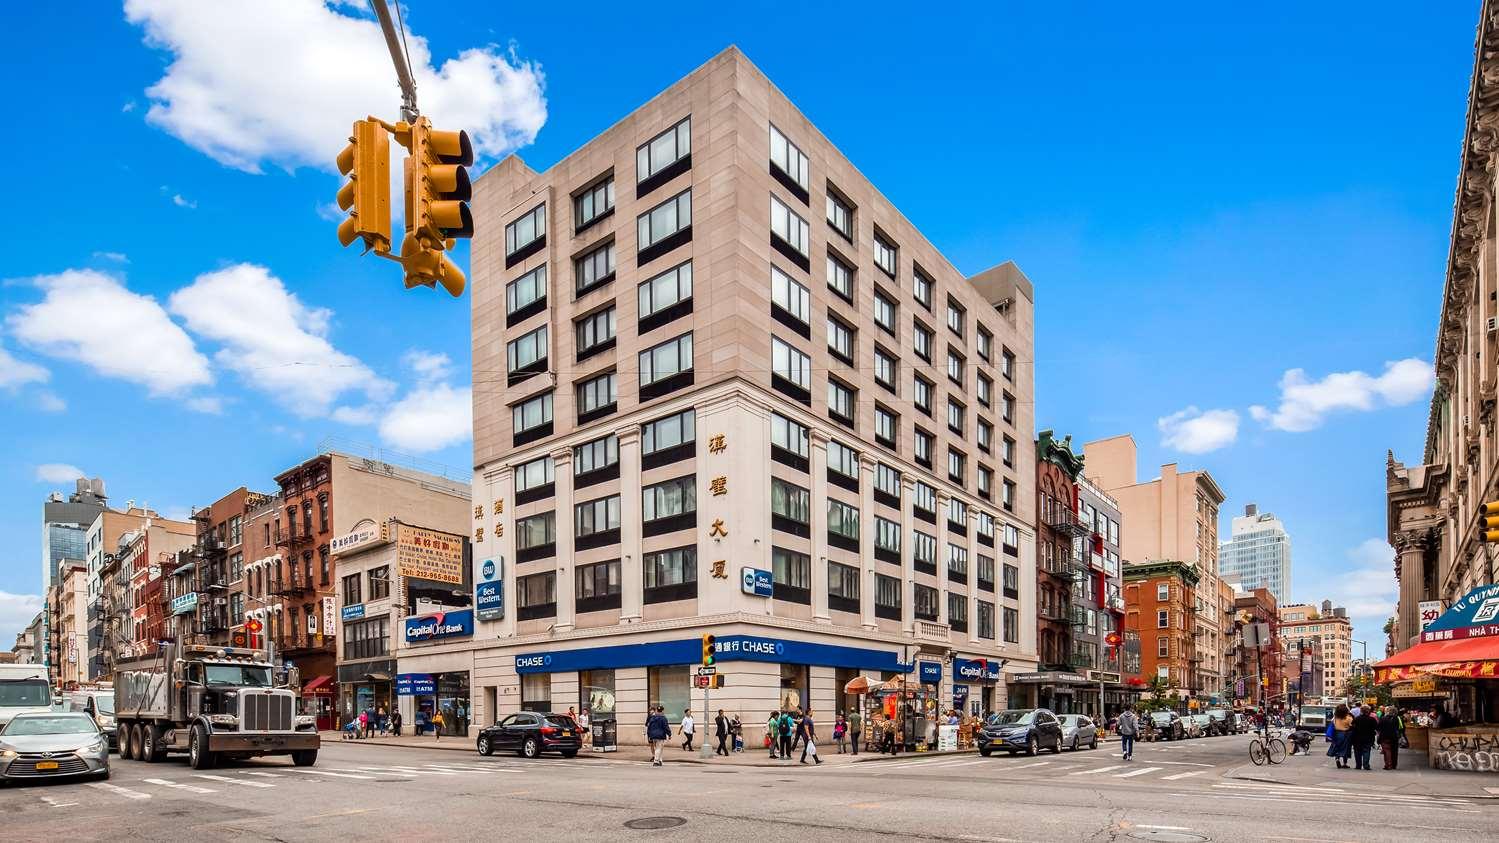 Best Western Bowery Hanbee Hotel | Hotels in New York, New York